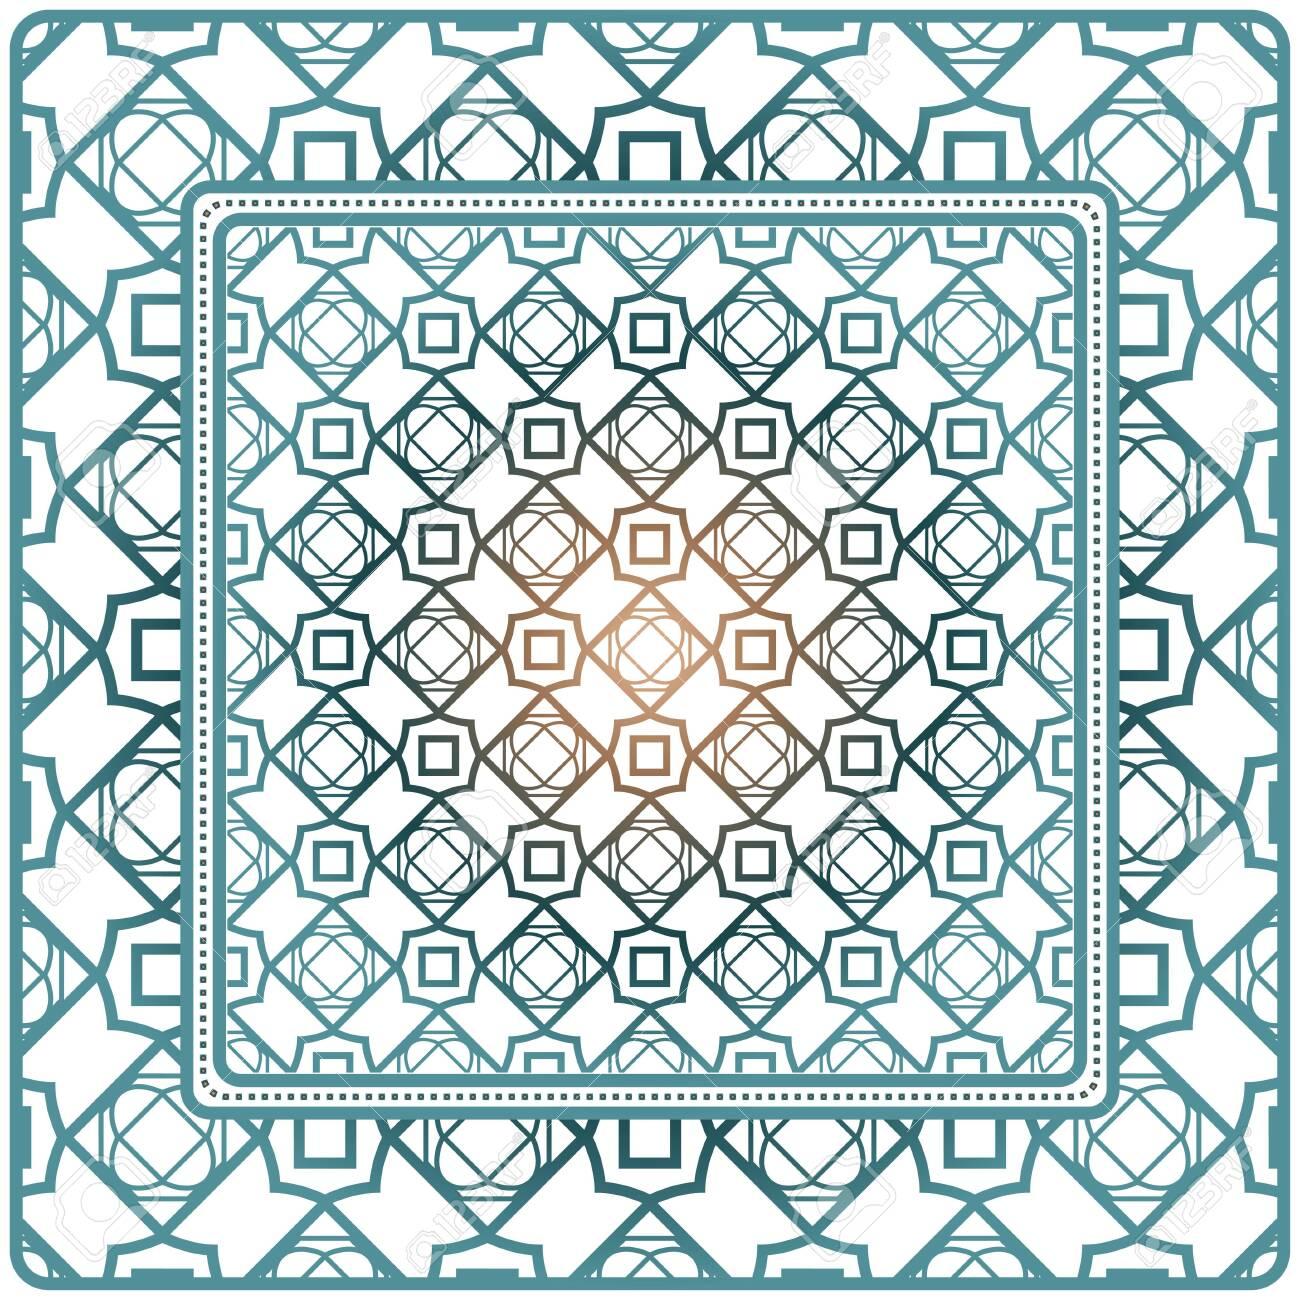 Decorative Ornament With Geometric Decoration. Symmetric Pattern . For Print Bandanna, Shawl, Tablecloth, Fabric Fashion, Scarf, Design. - 121613773